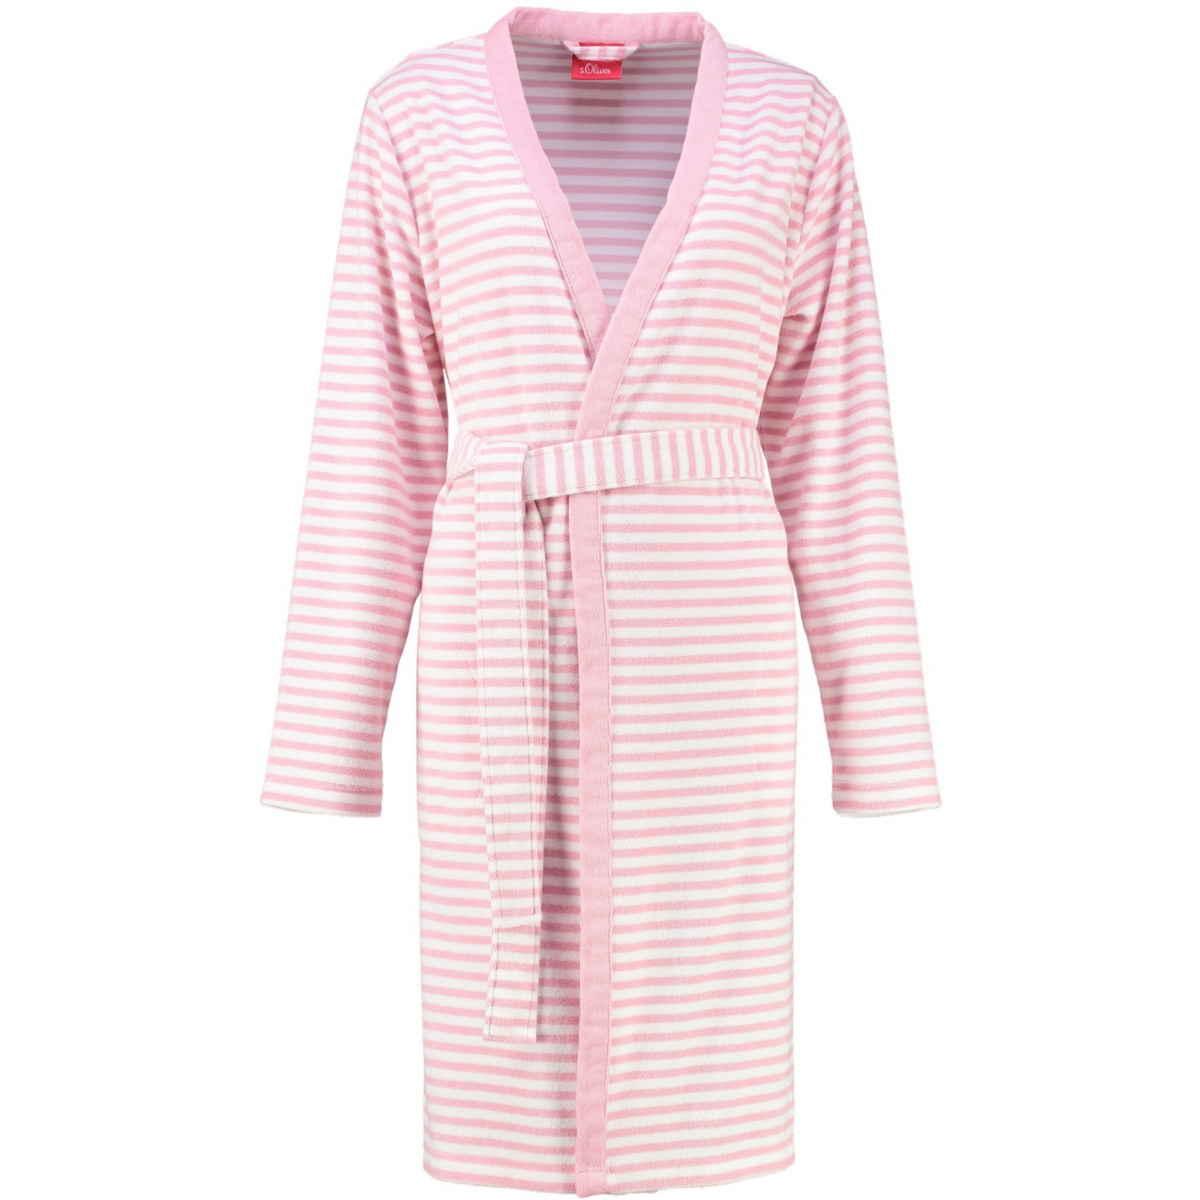 new product 86805 987f1 s.Oliver women's terry kimono bathrobe 3712 20 striped pink